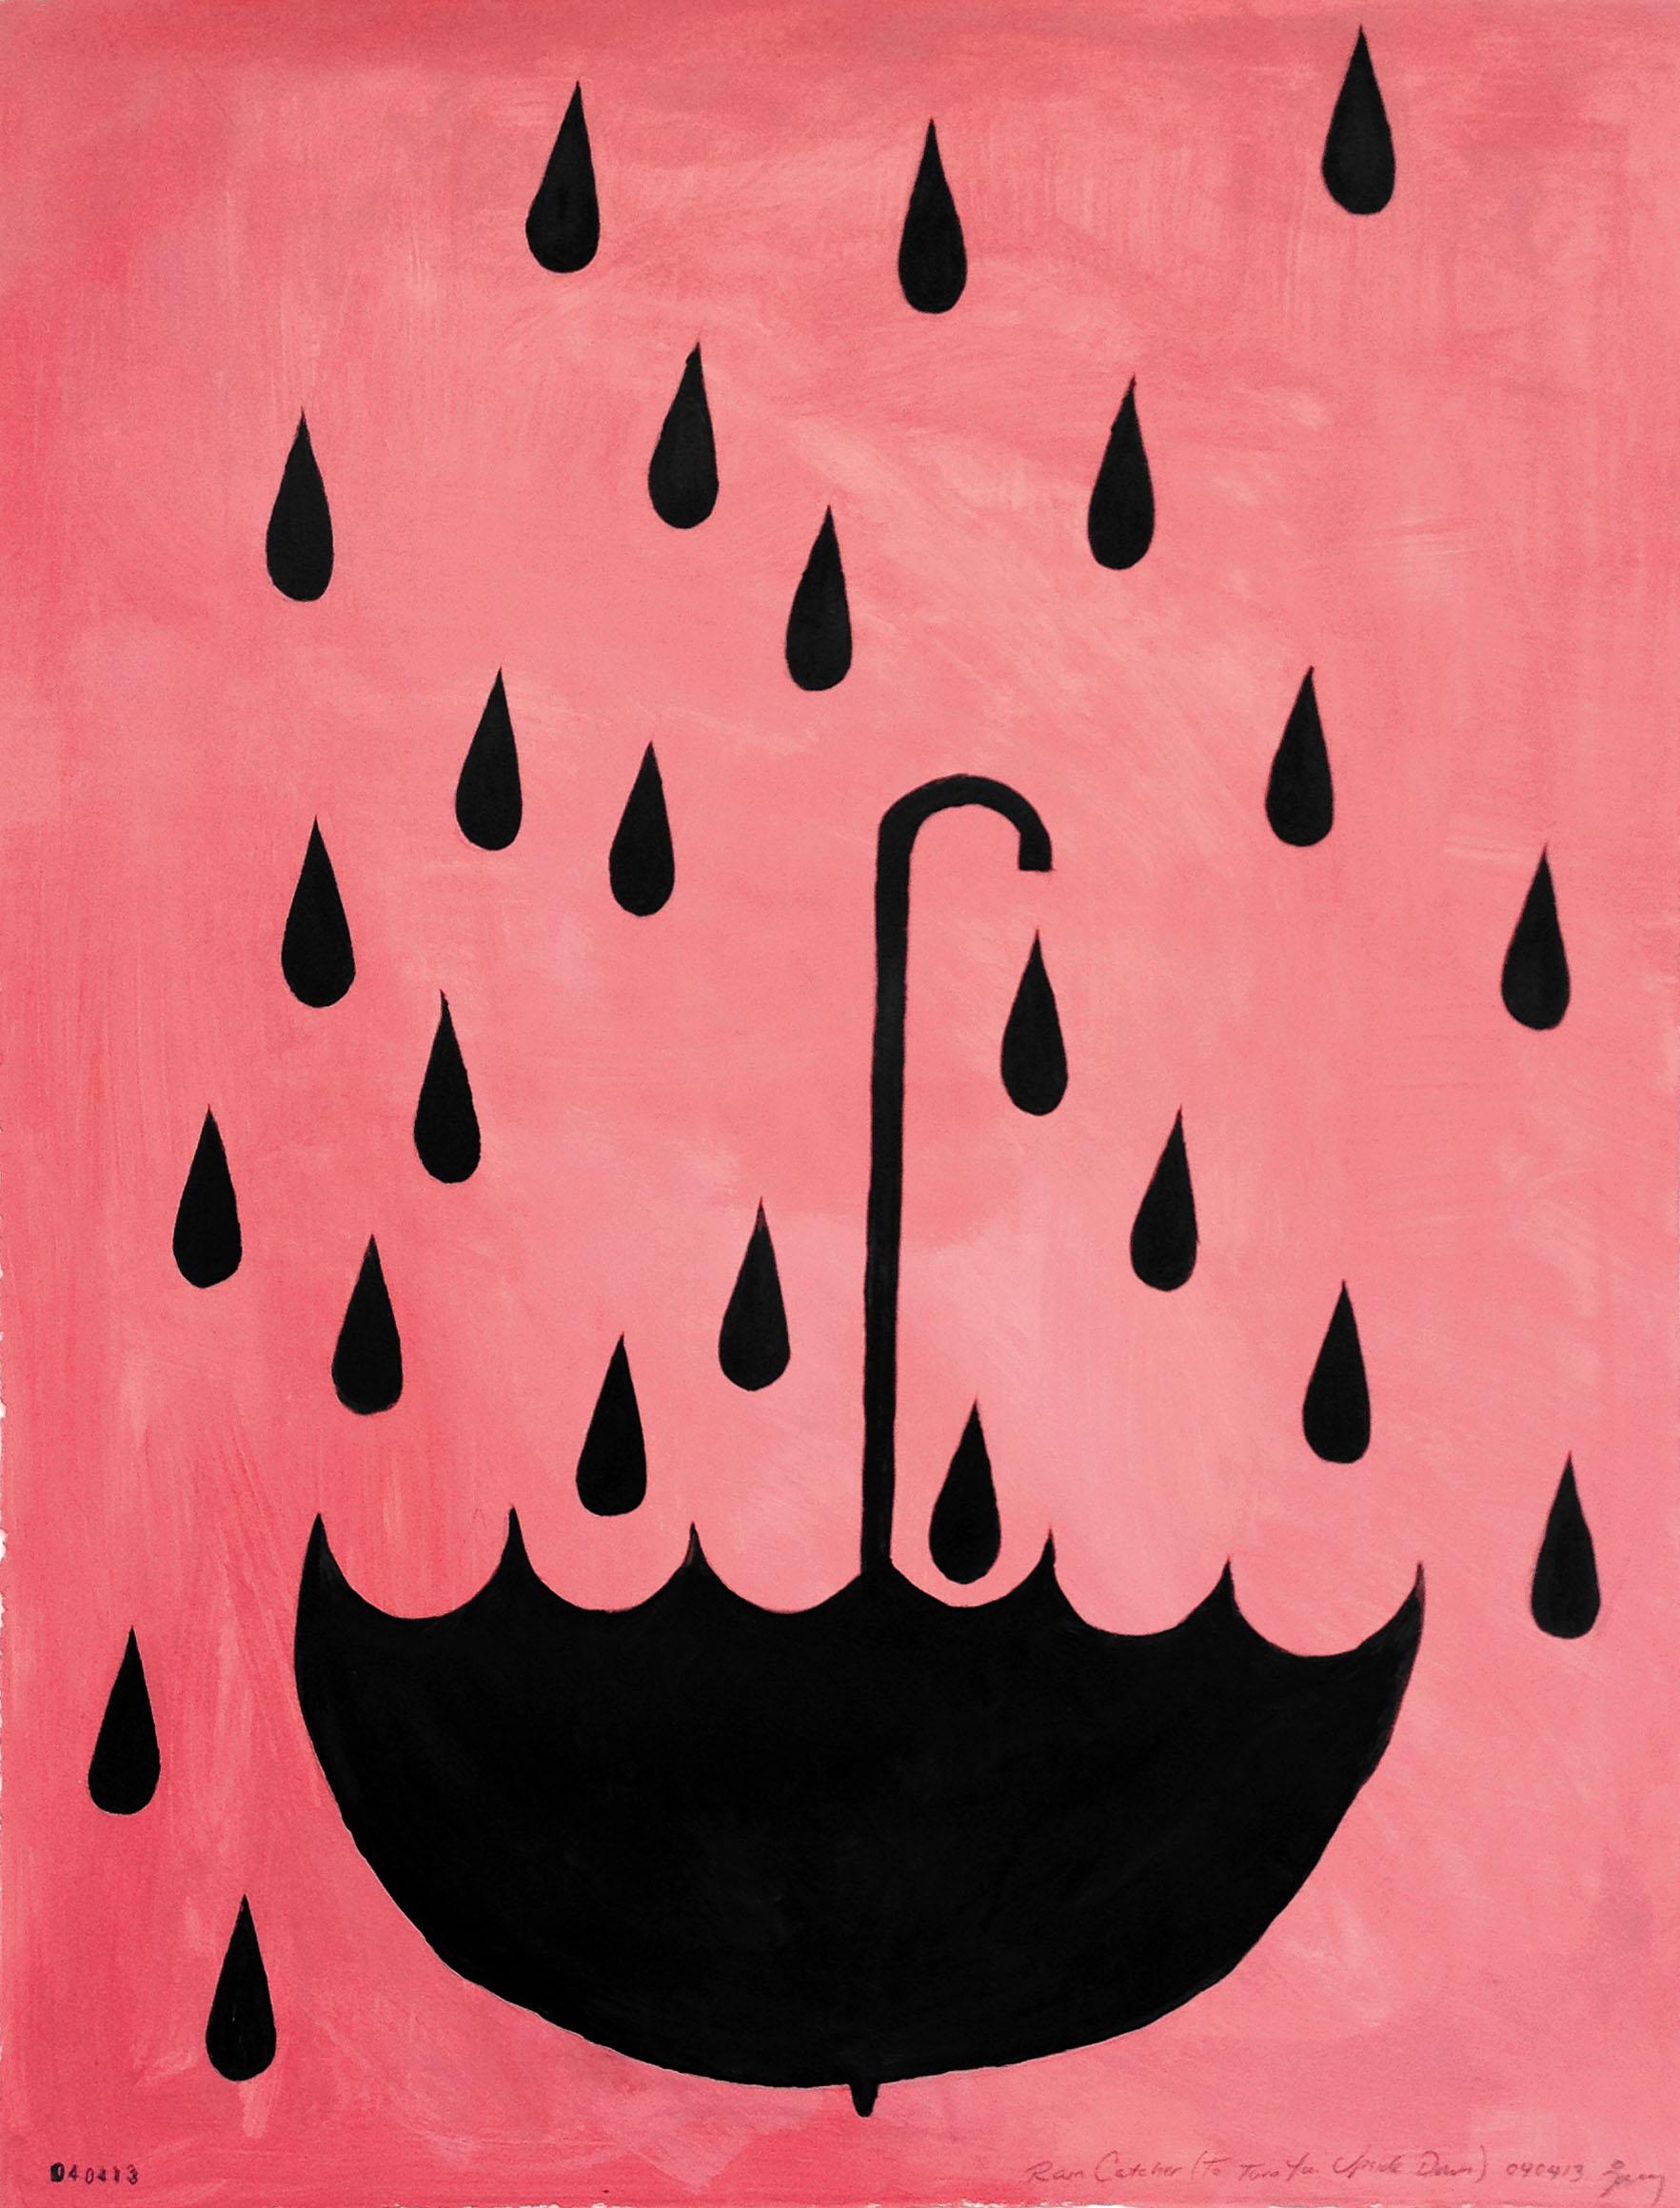 rain catcher (to turn you upside down.jpg